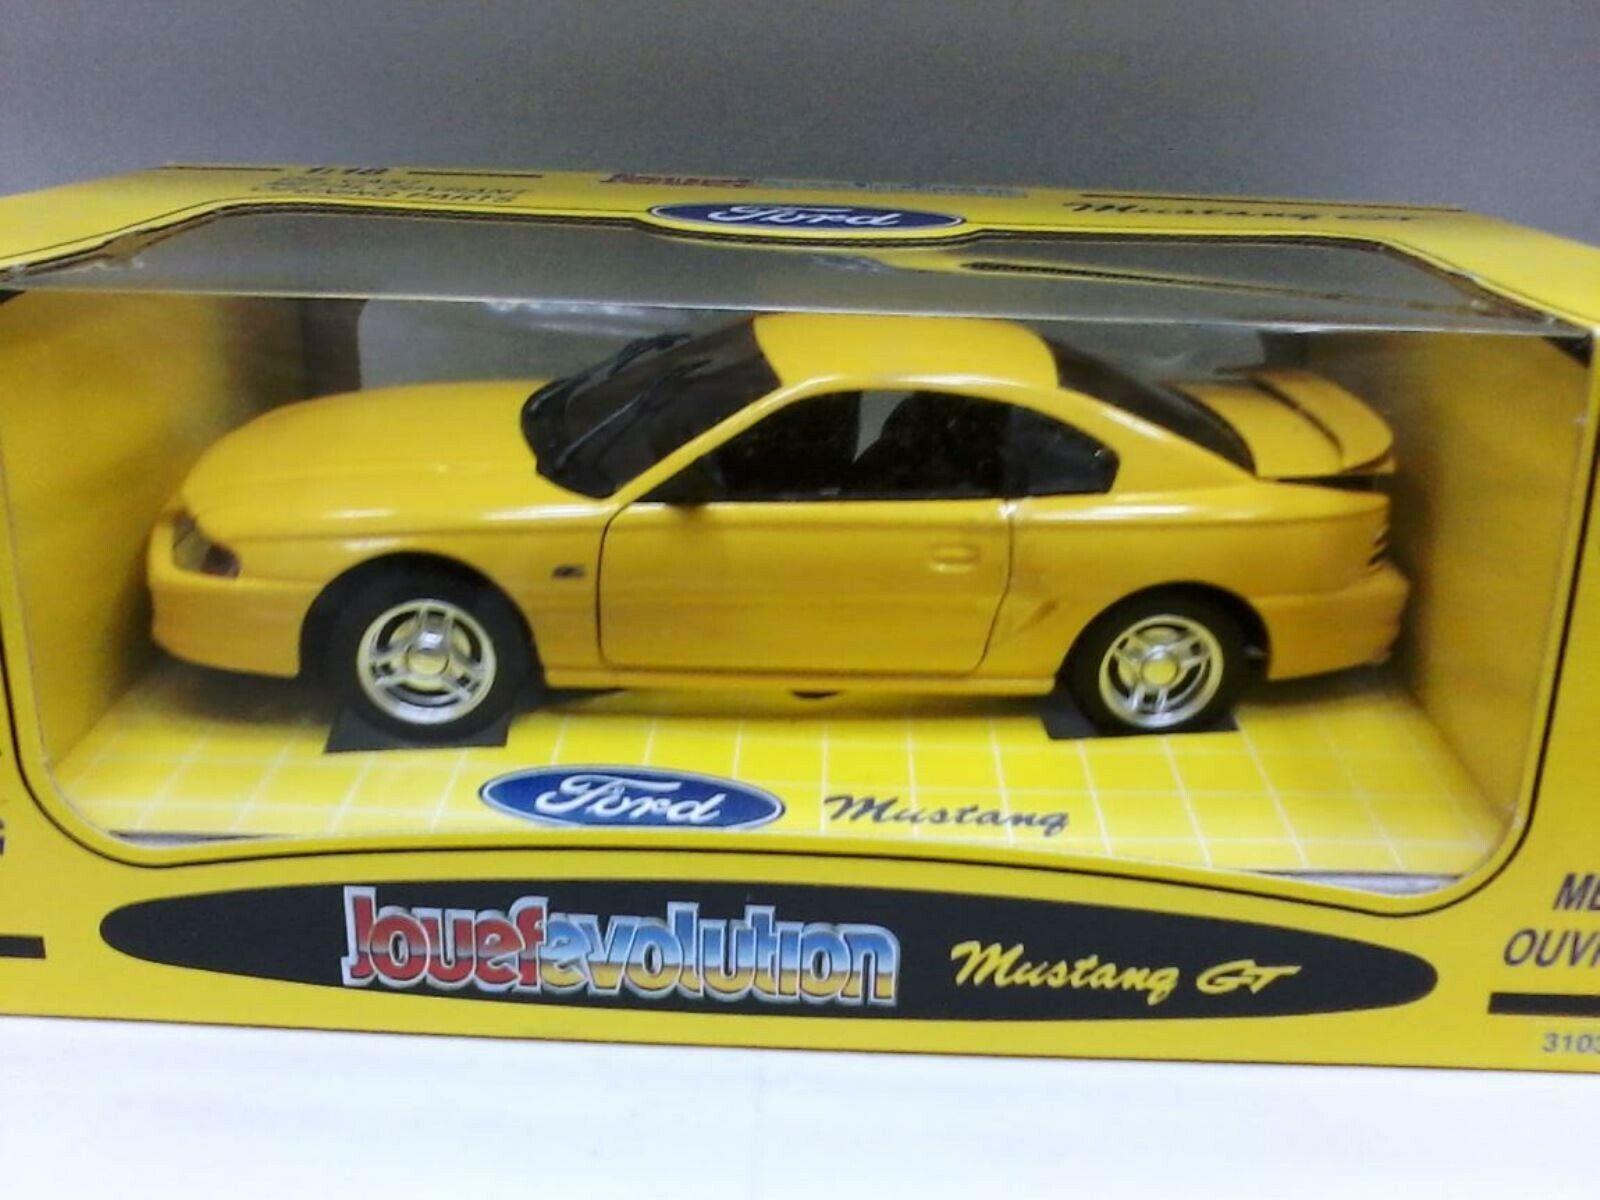 Wow Wow Wow extrêmement rare Ford Mustang GT 1994 5.0 L V8 coupé jaune 1 18 Jouef-AUTO ART 1ef366